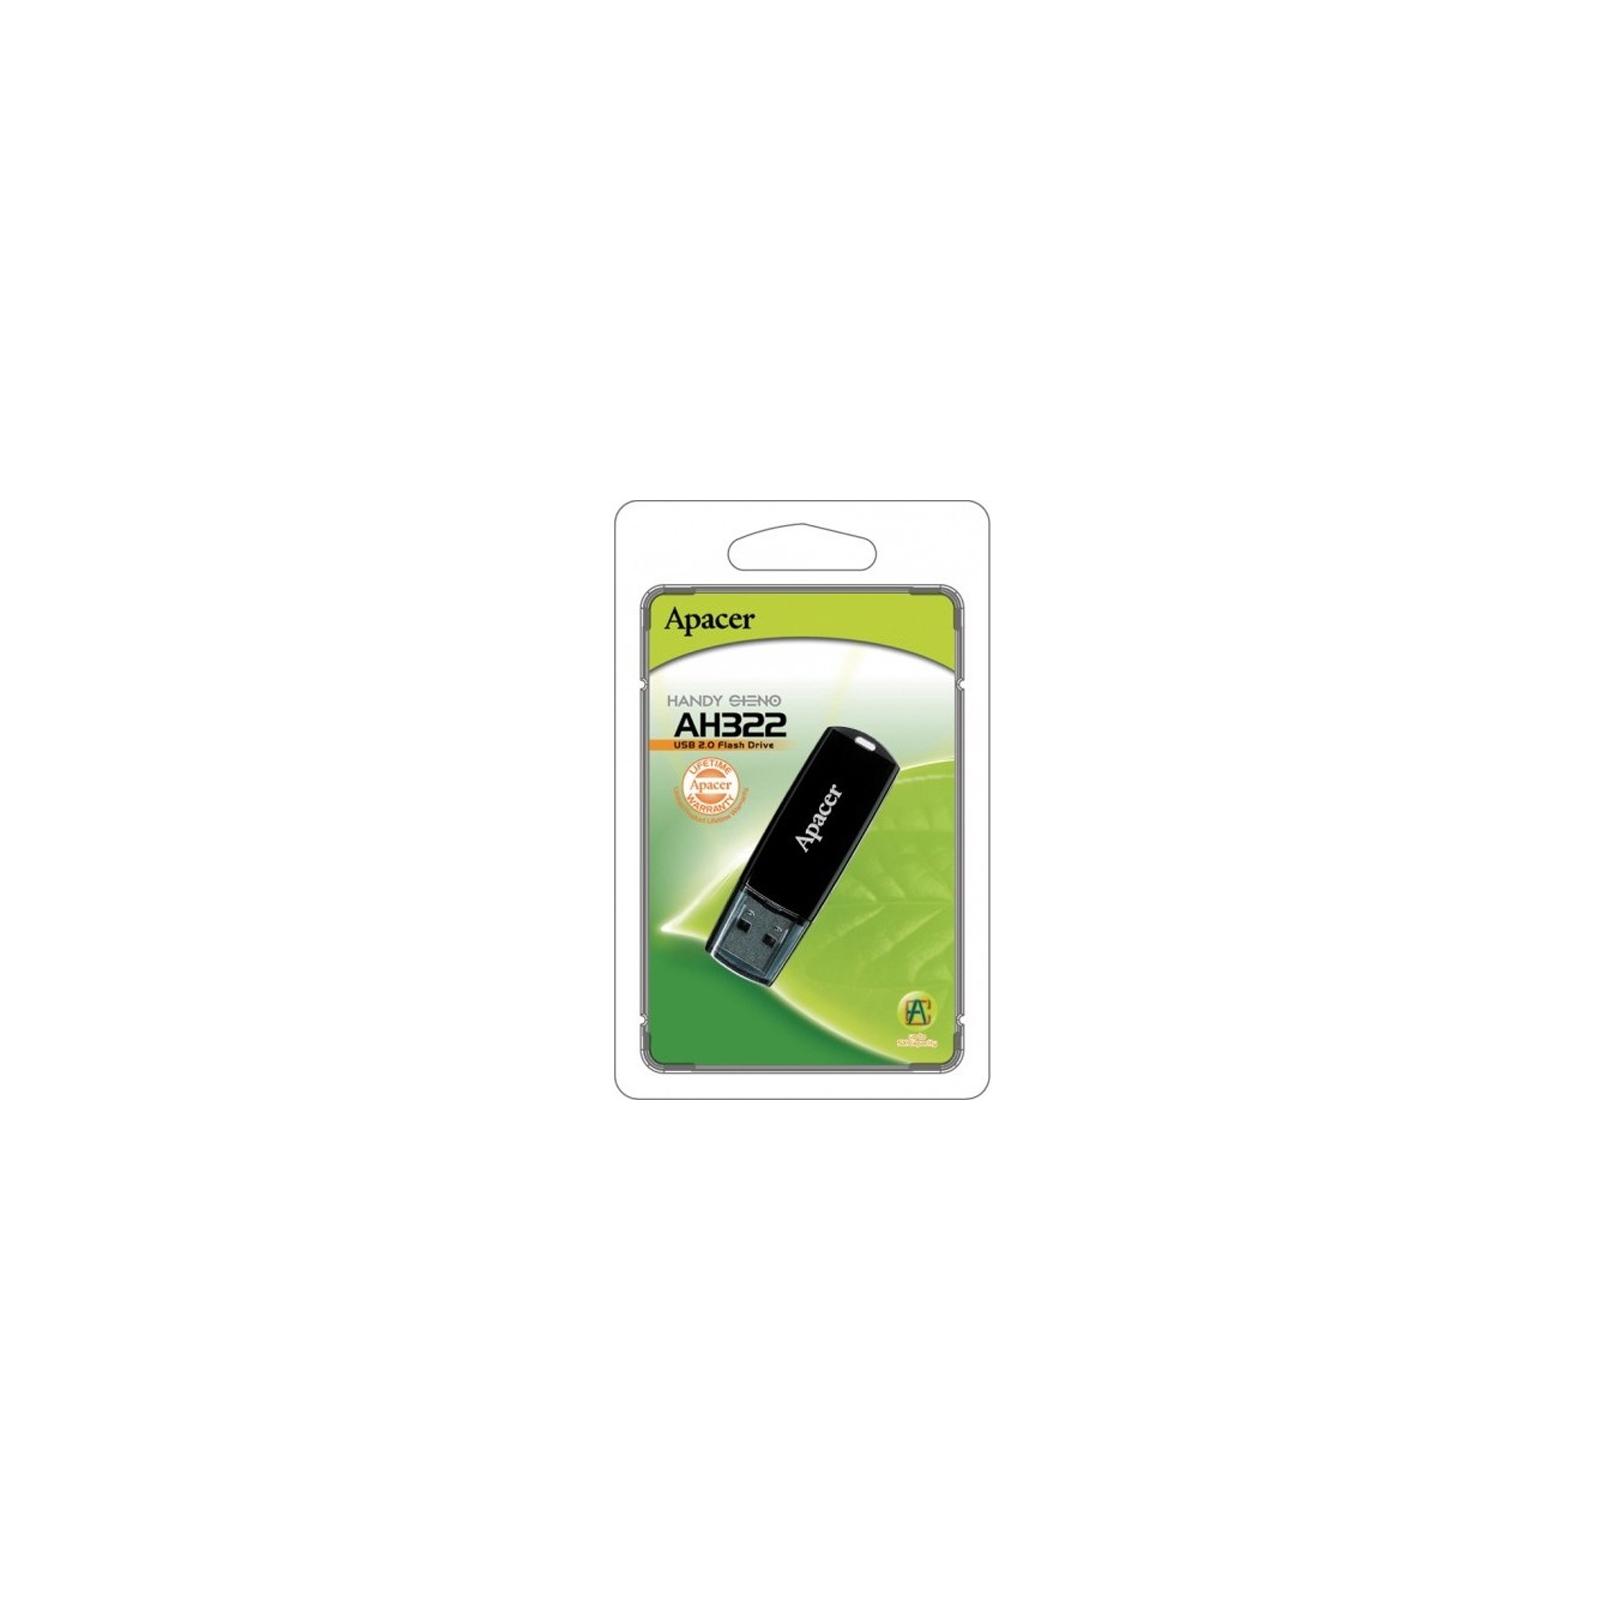 USB флеш накопитель Handy Steno AH322 black Apacer (AP16GAH322B-1) изображение 4